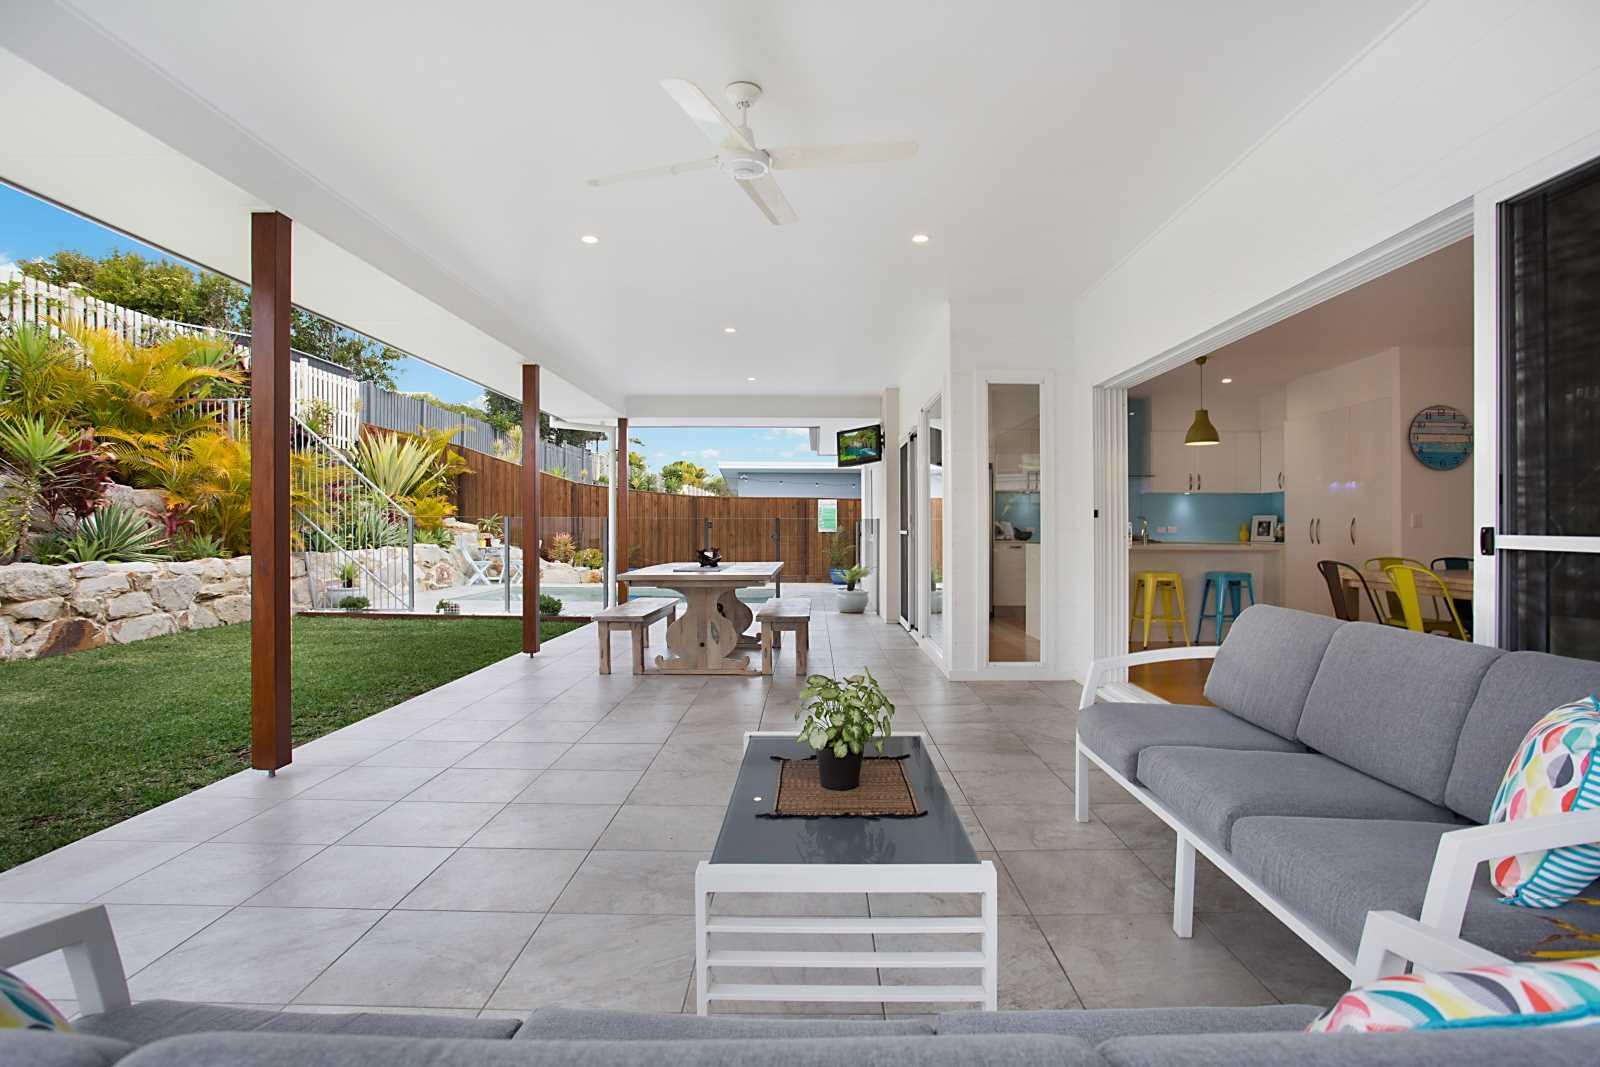 Modern Open Plan Entertainer's Home